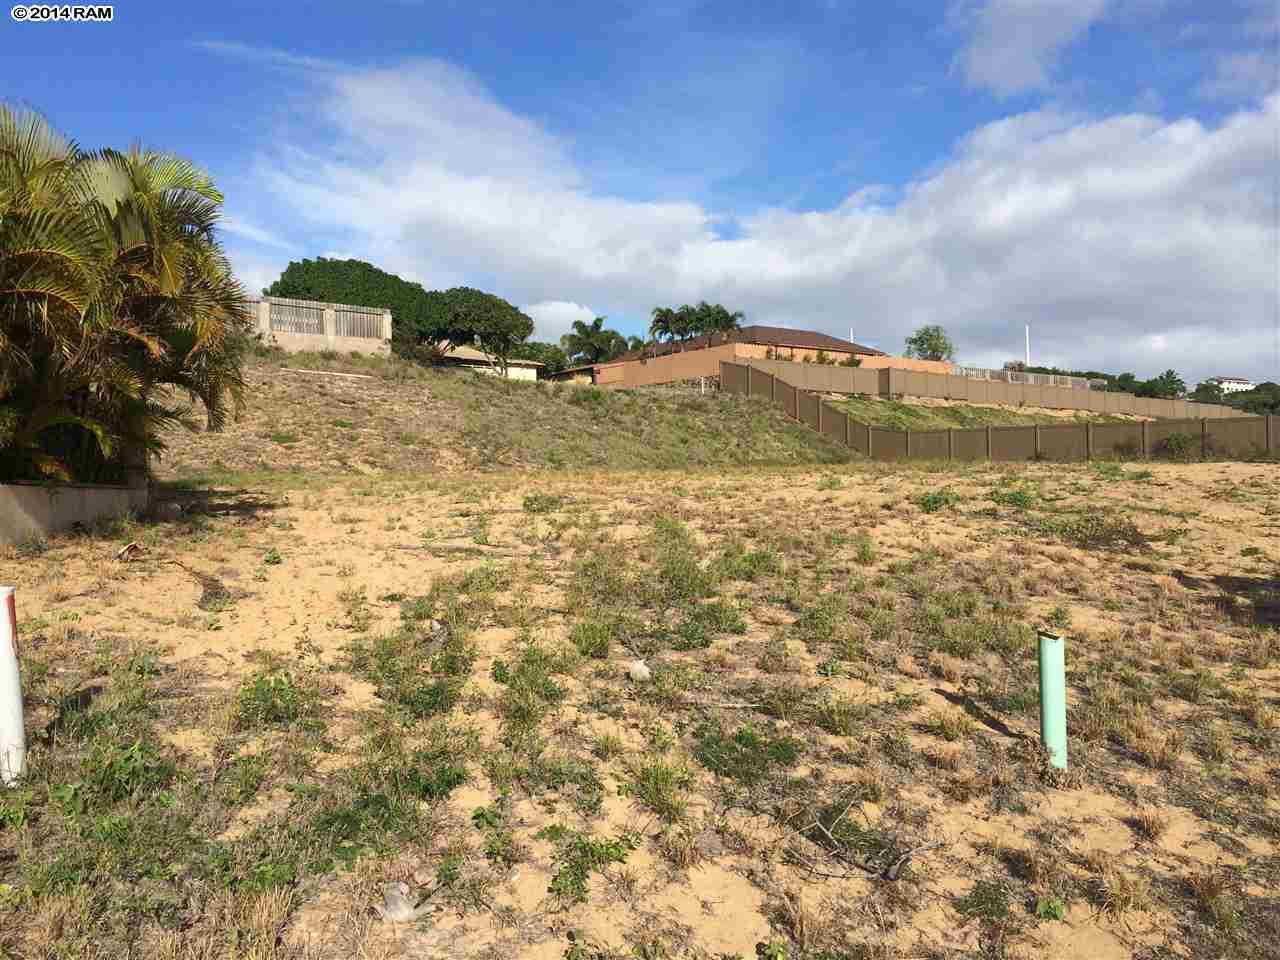 68 Keoneloa St Lot 31 Wailuku, Hi 96793 vacant land - photo 1 of 8